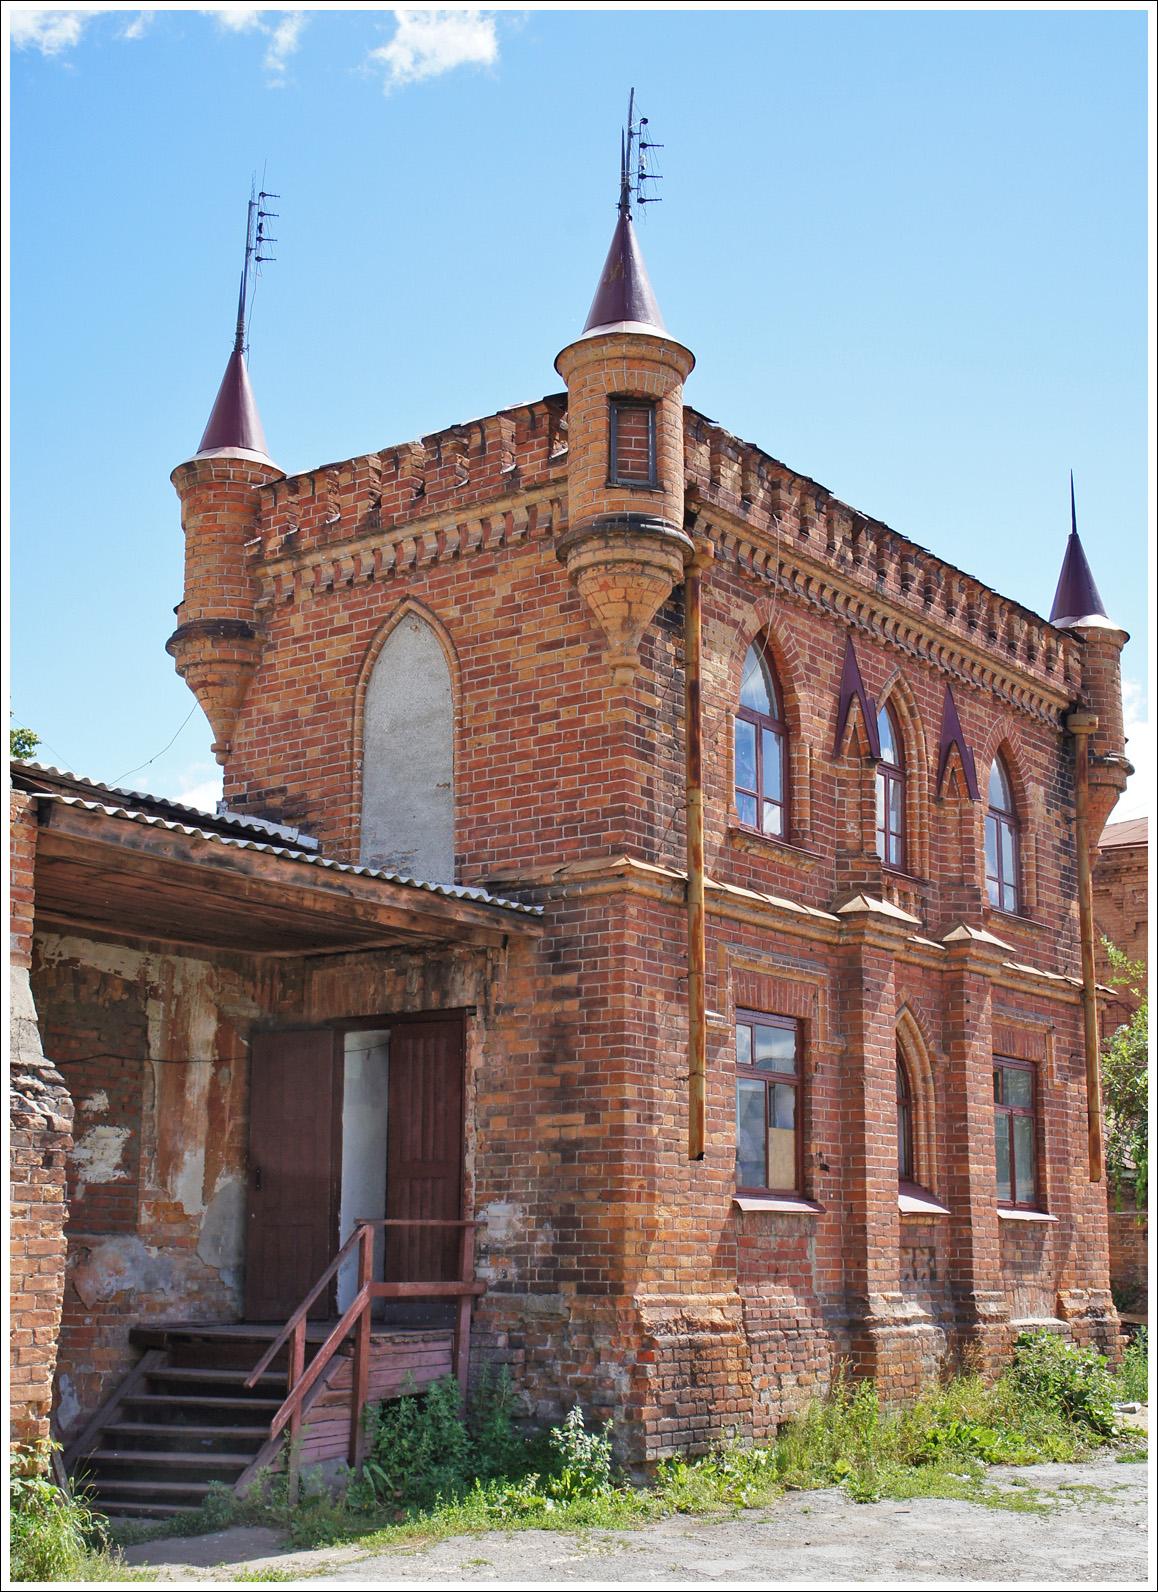 то ли архитектор привез идею, то ли сам купец побывал в Европе и захотел готический замок в Ирбите построить